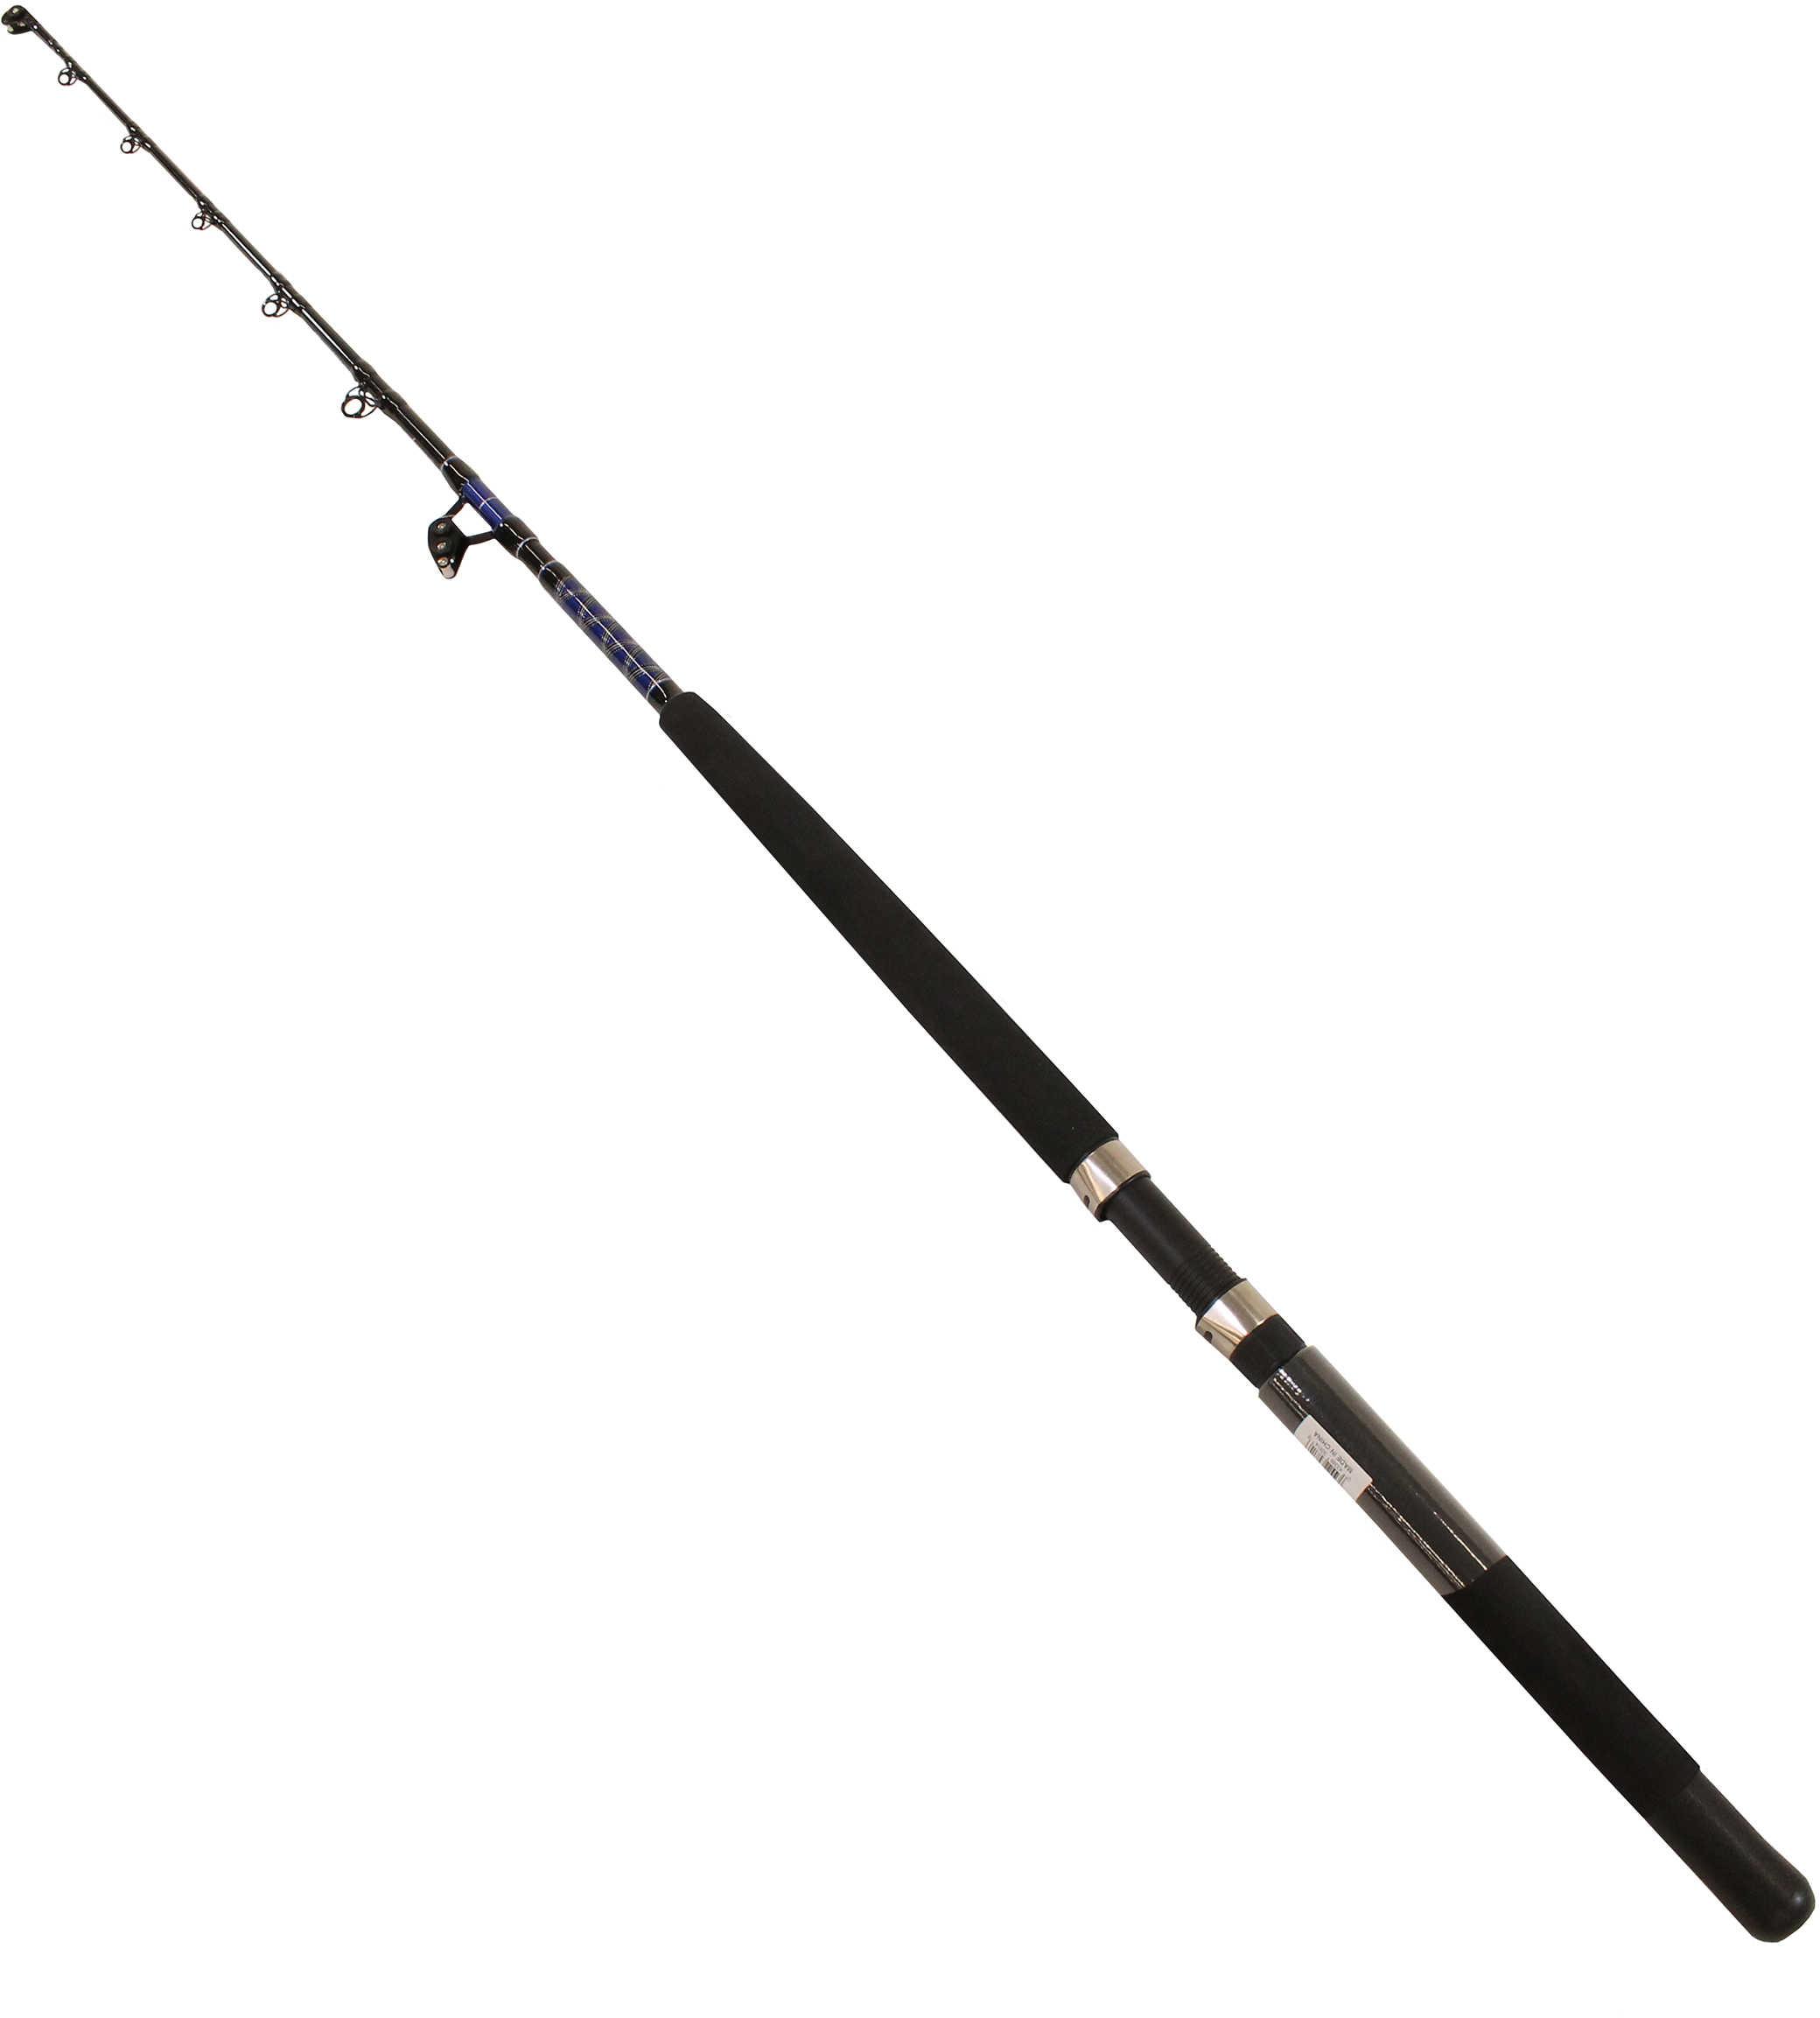 "Shakespeare Tidewater Rod 5'6"", 1 Piece, 50-130 lb 1265916"